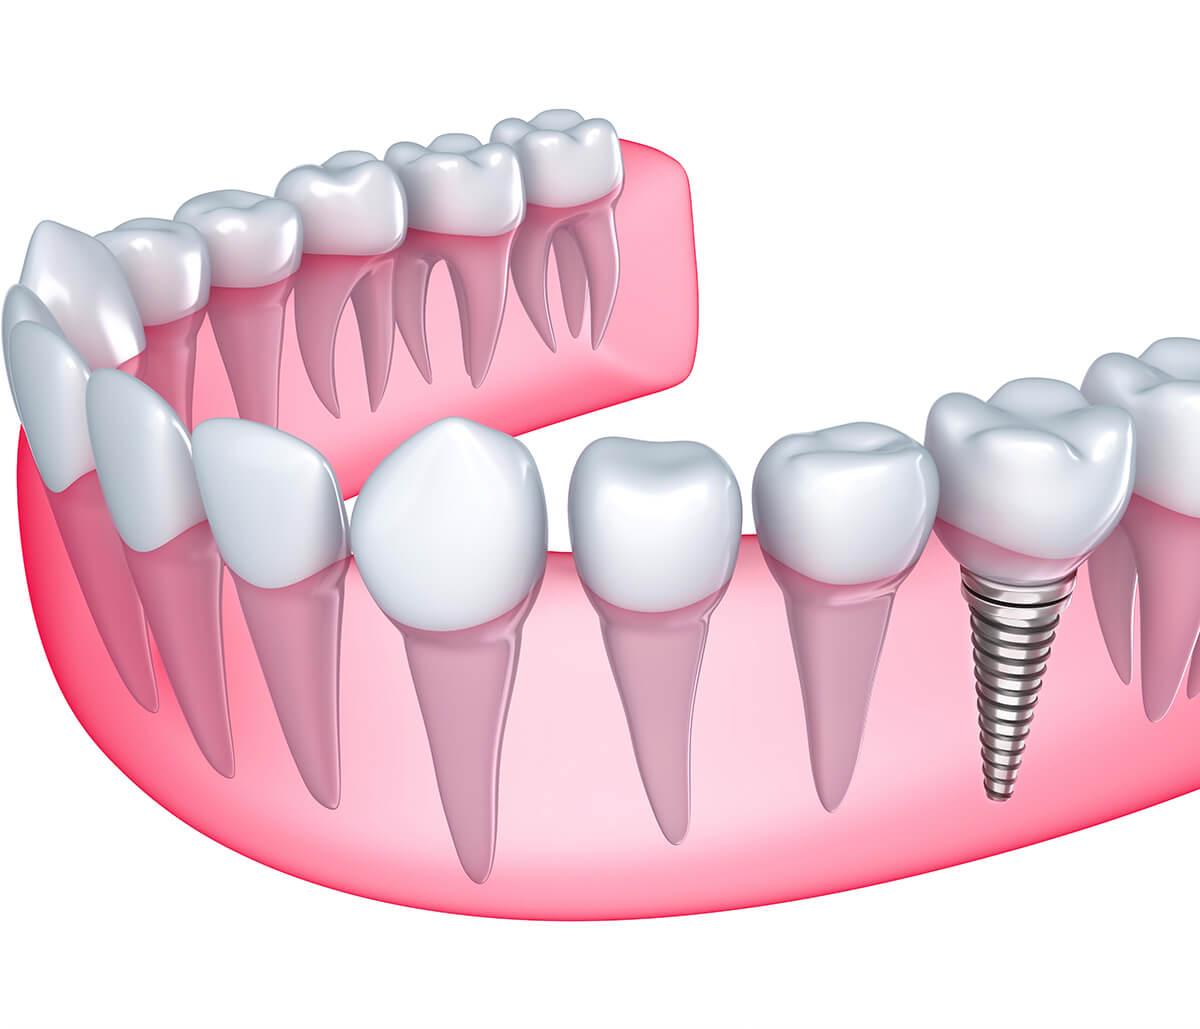 Cosmetic Dental Implants in Winston-salem NC Area